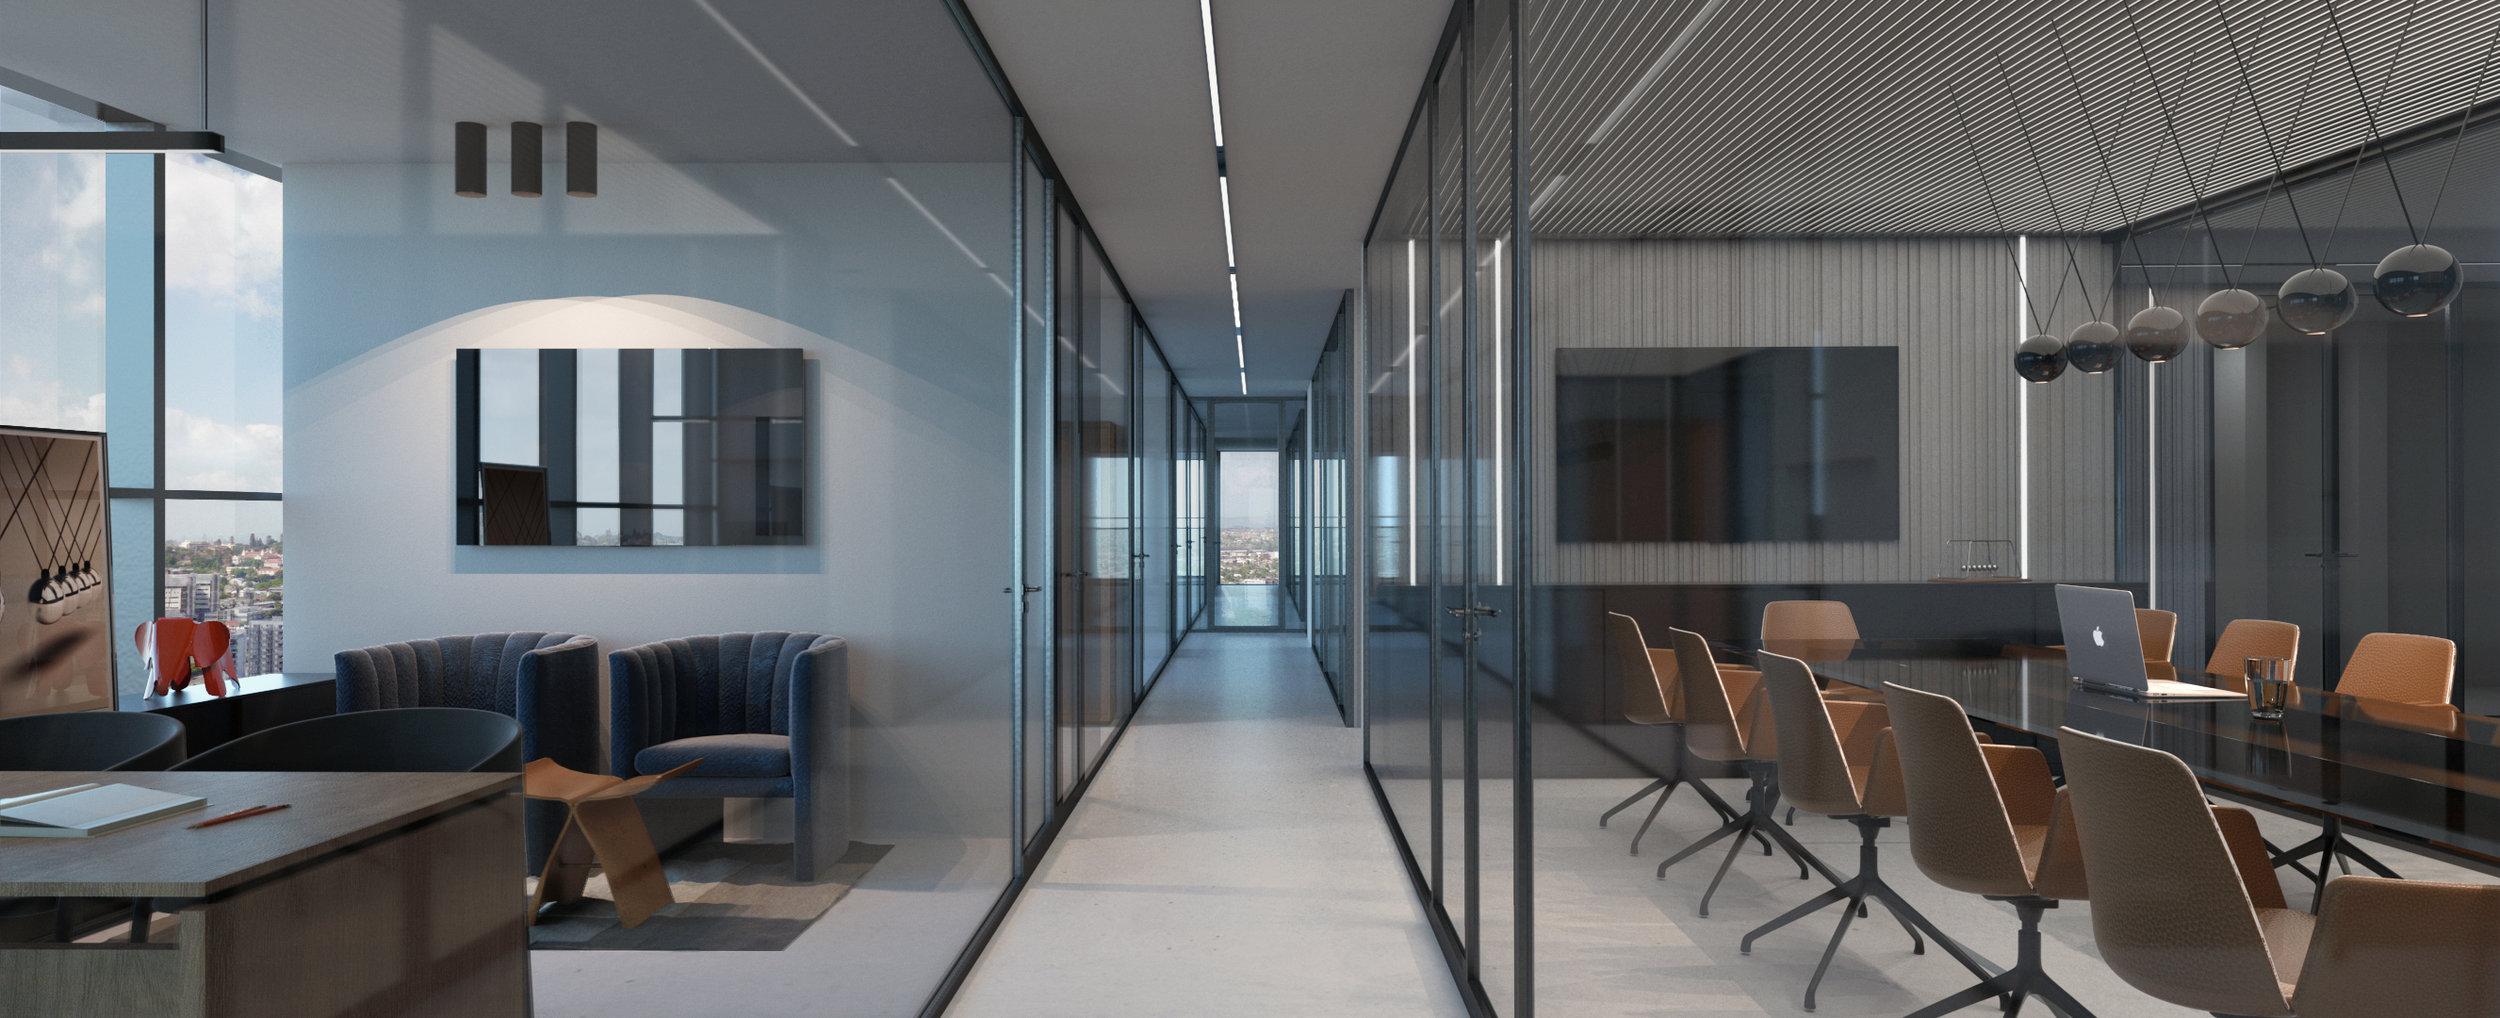 3_corridor.jpg